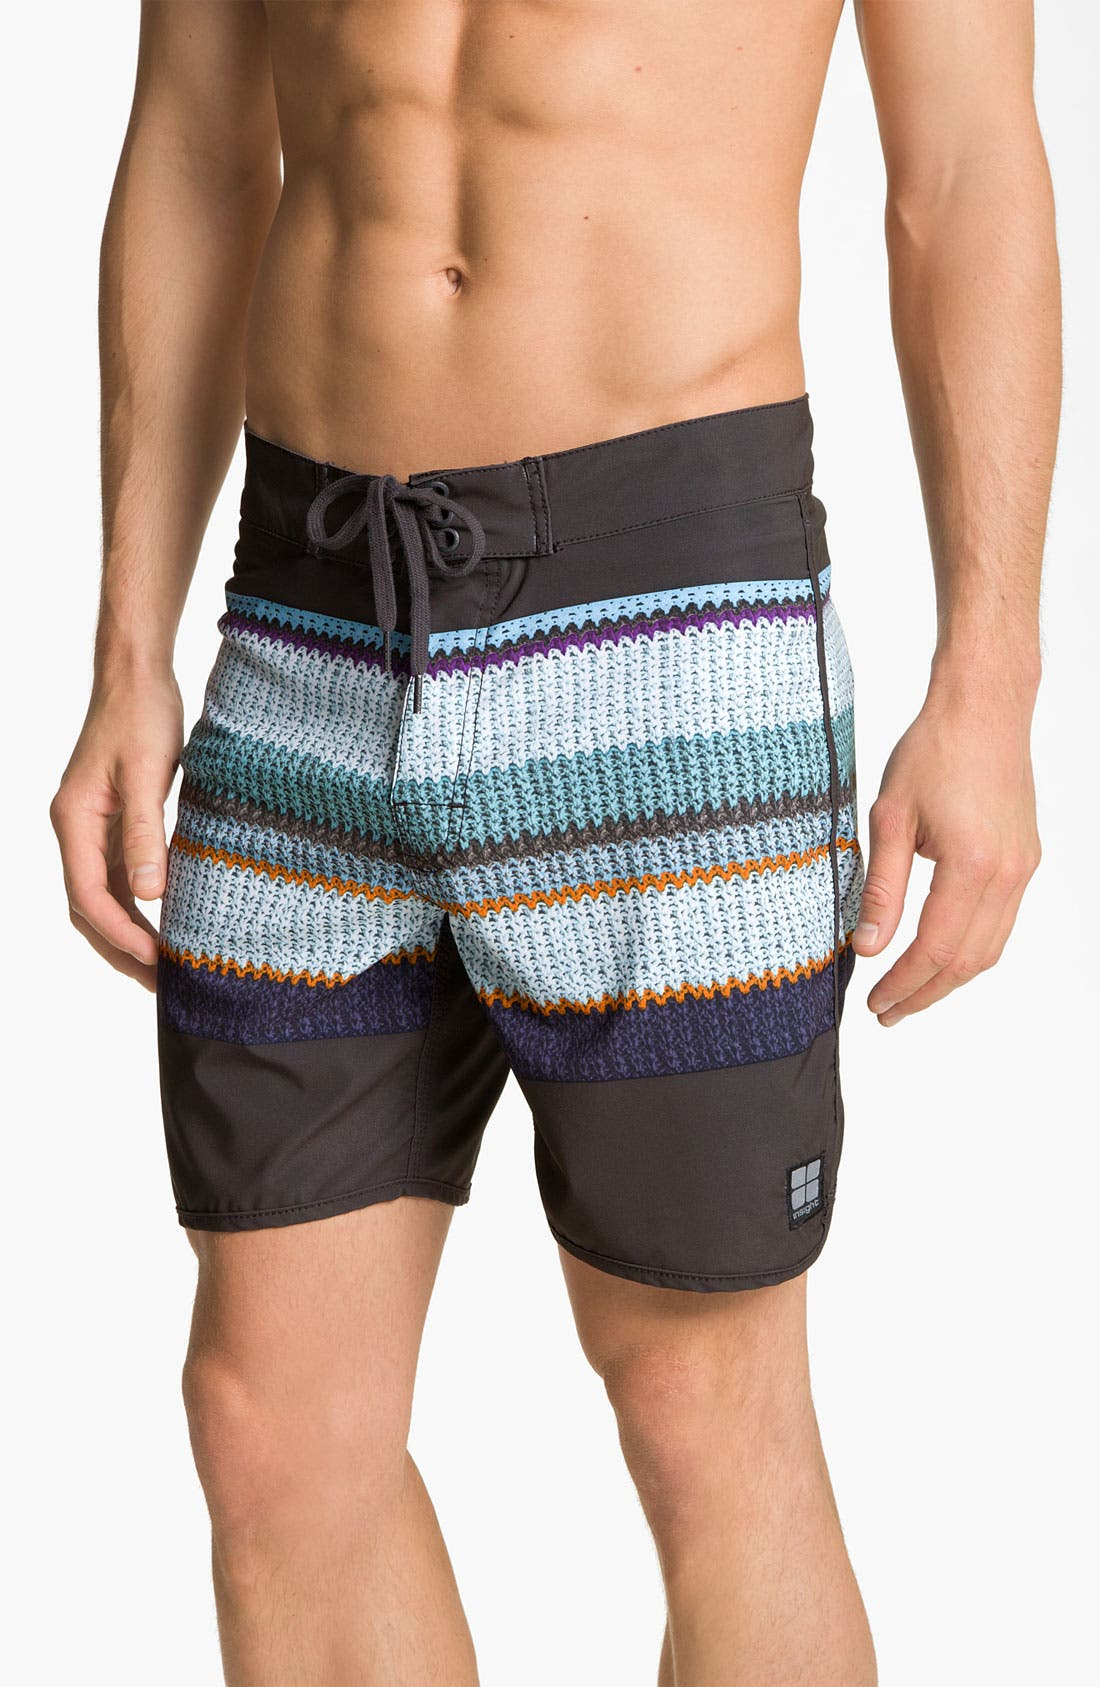 Alternate Image 1 Selected - Insight 'Knitta Bro' Board Shorts